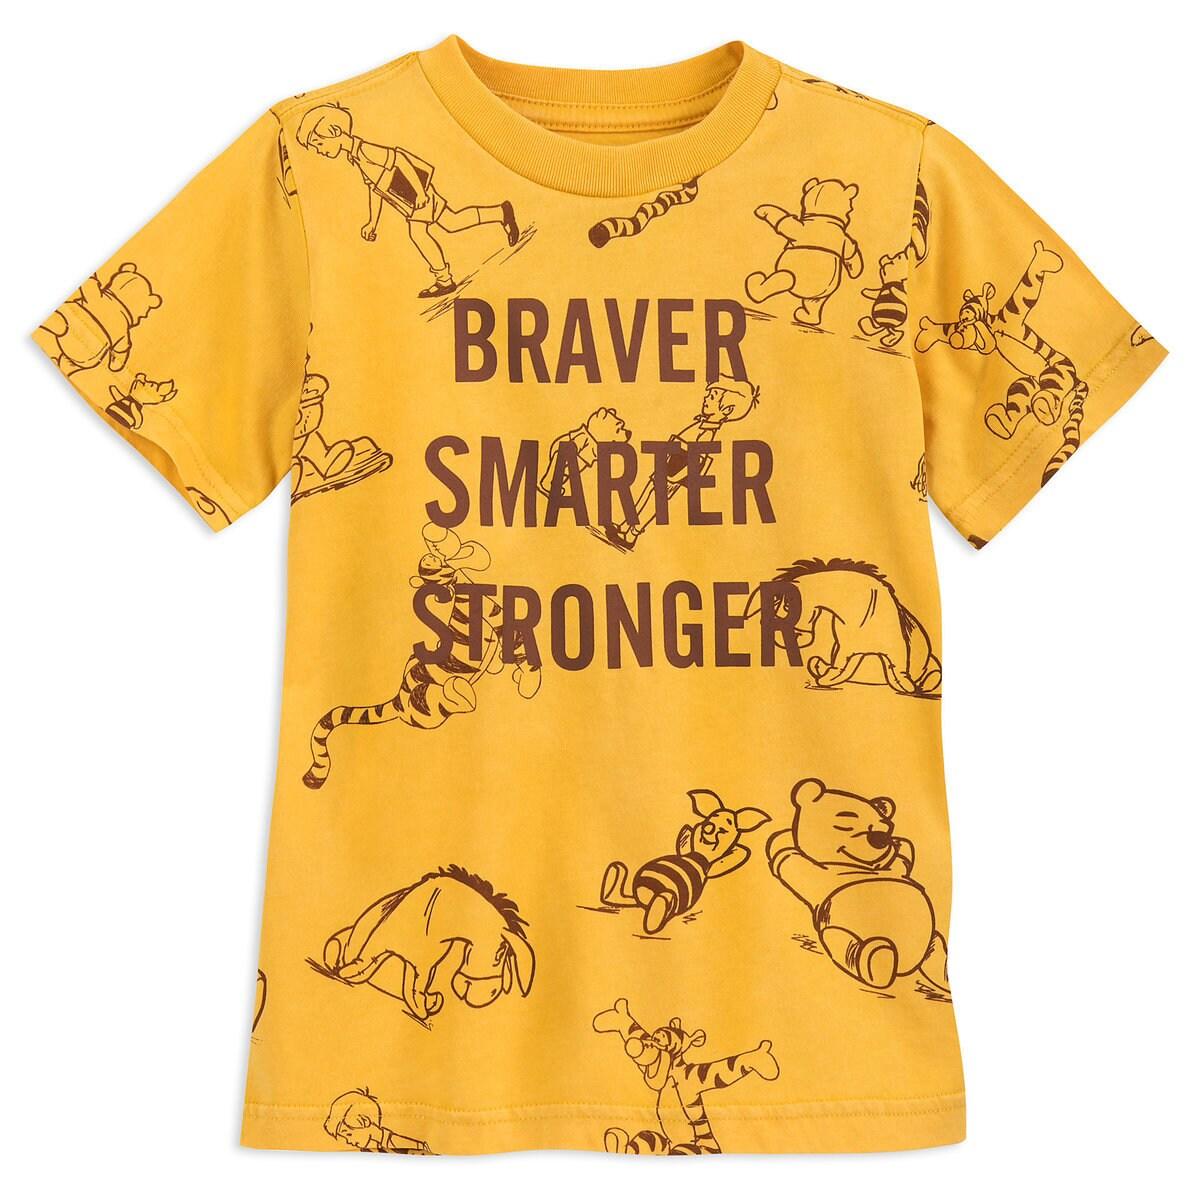 Winnie the Pooh T-Shirt for Kids | shopDisney